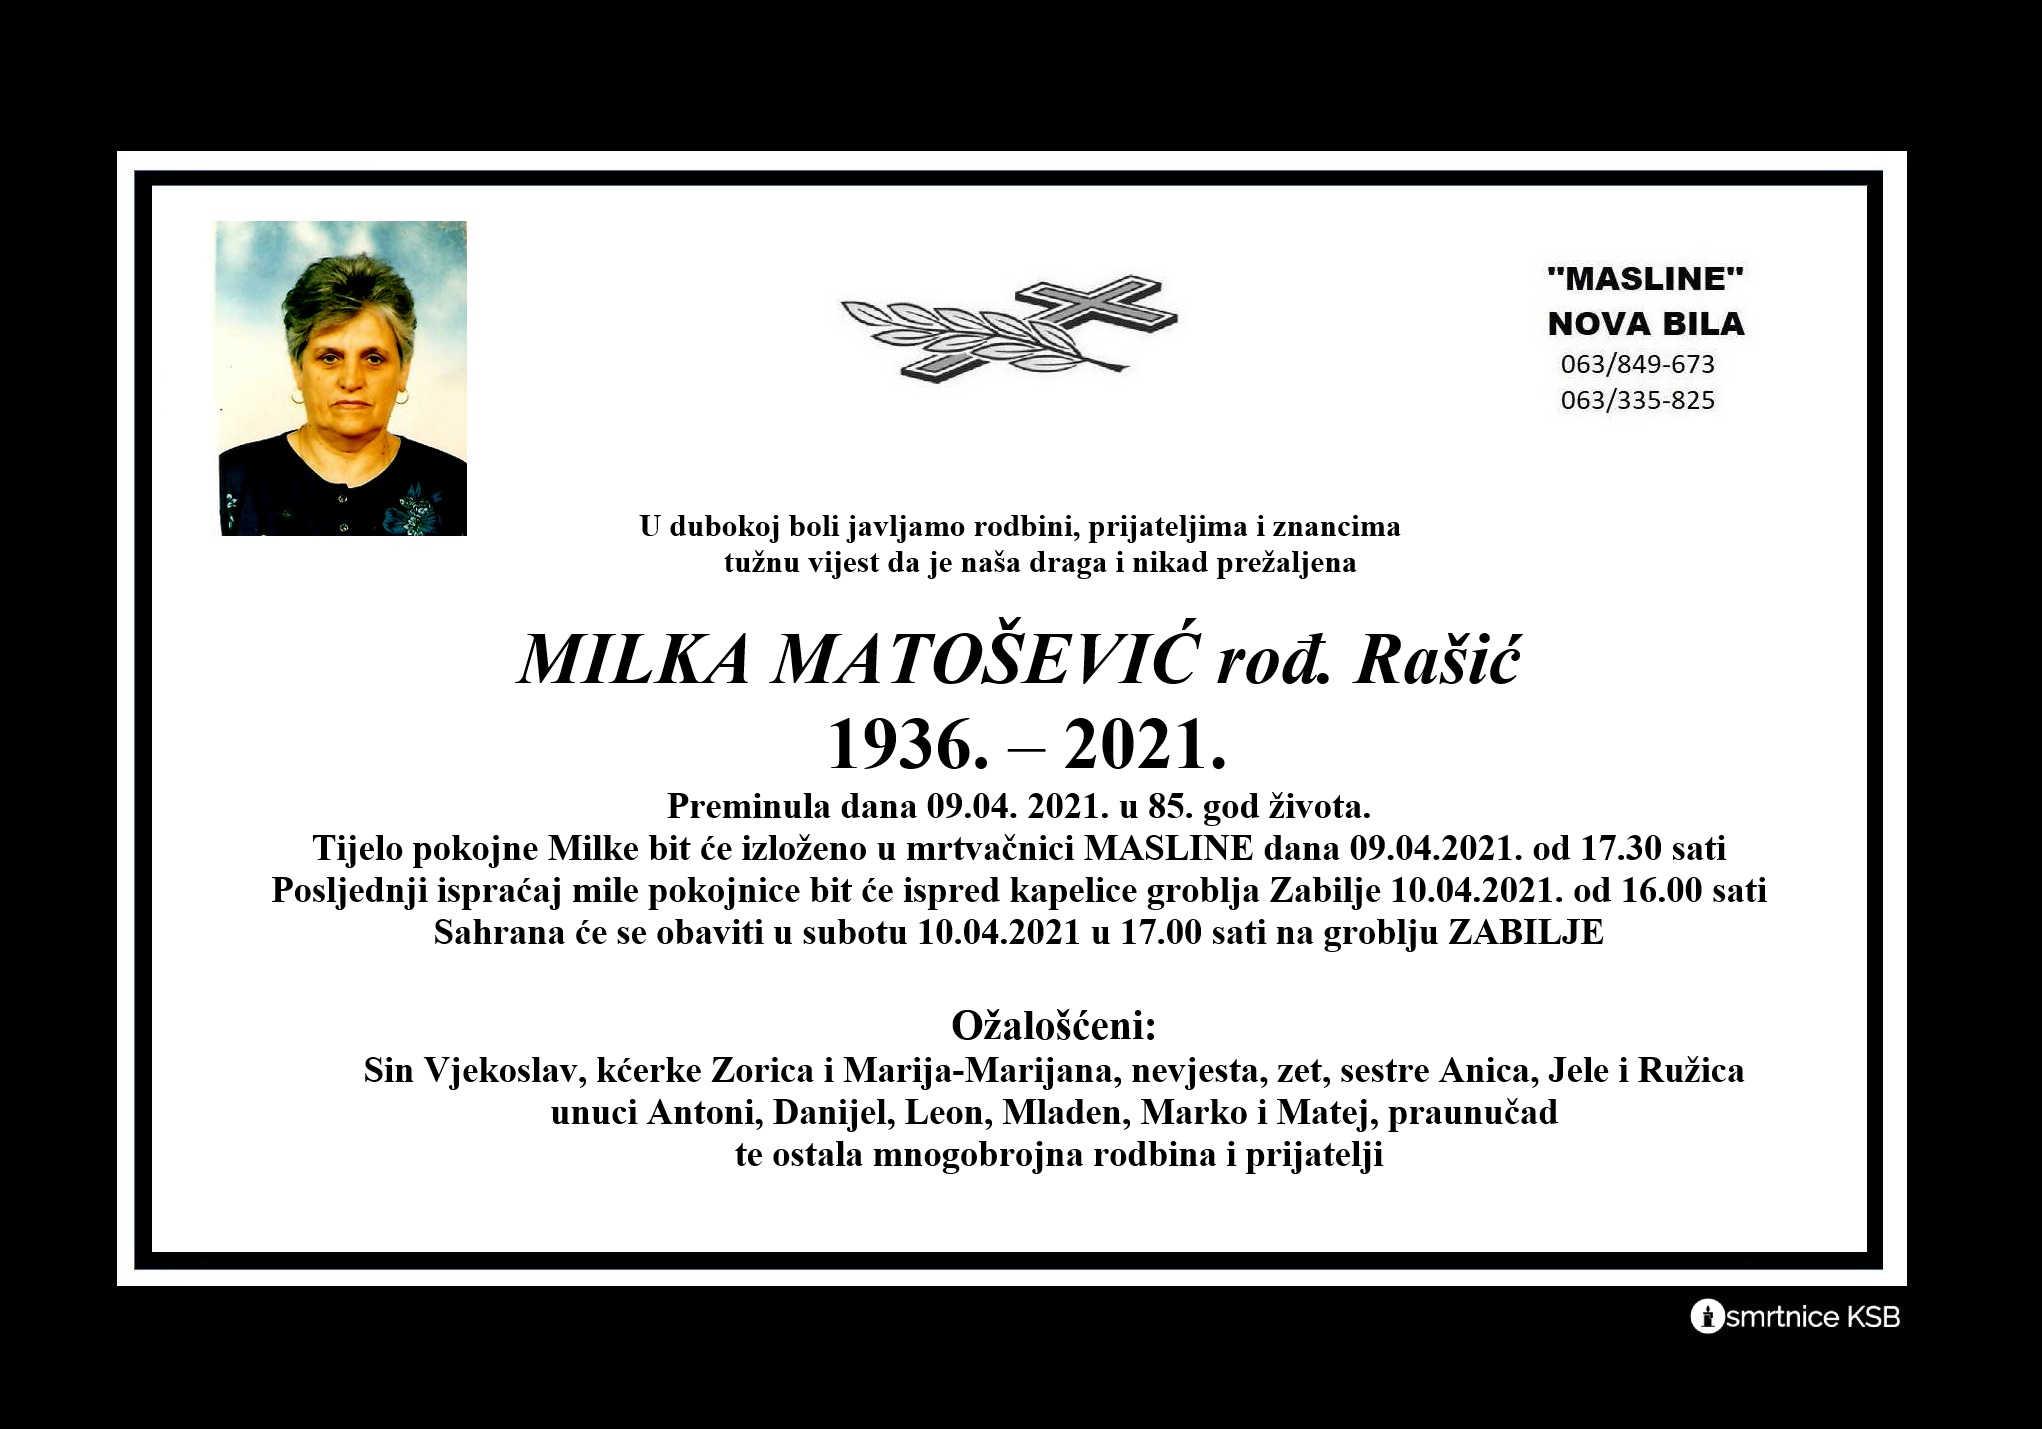 Milka Matošević rođ. Rašić